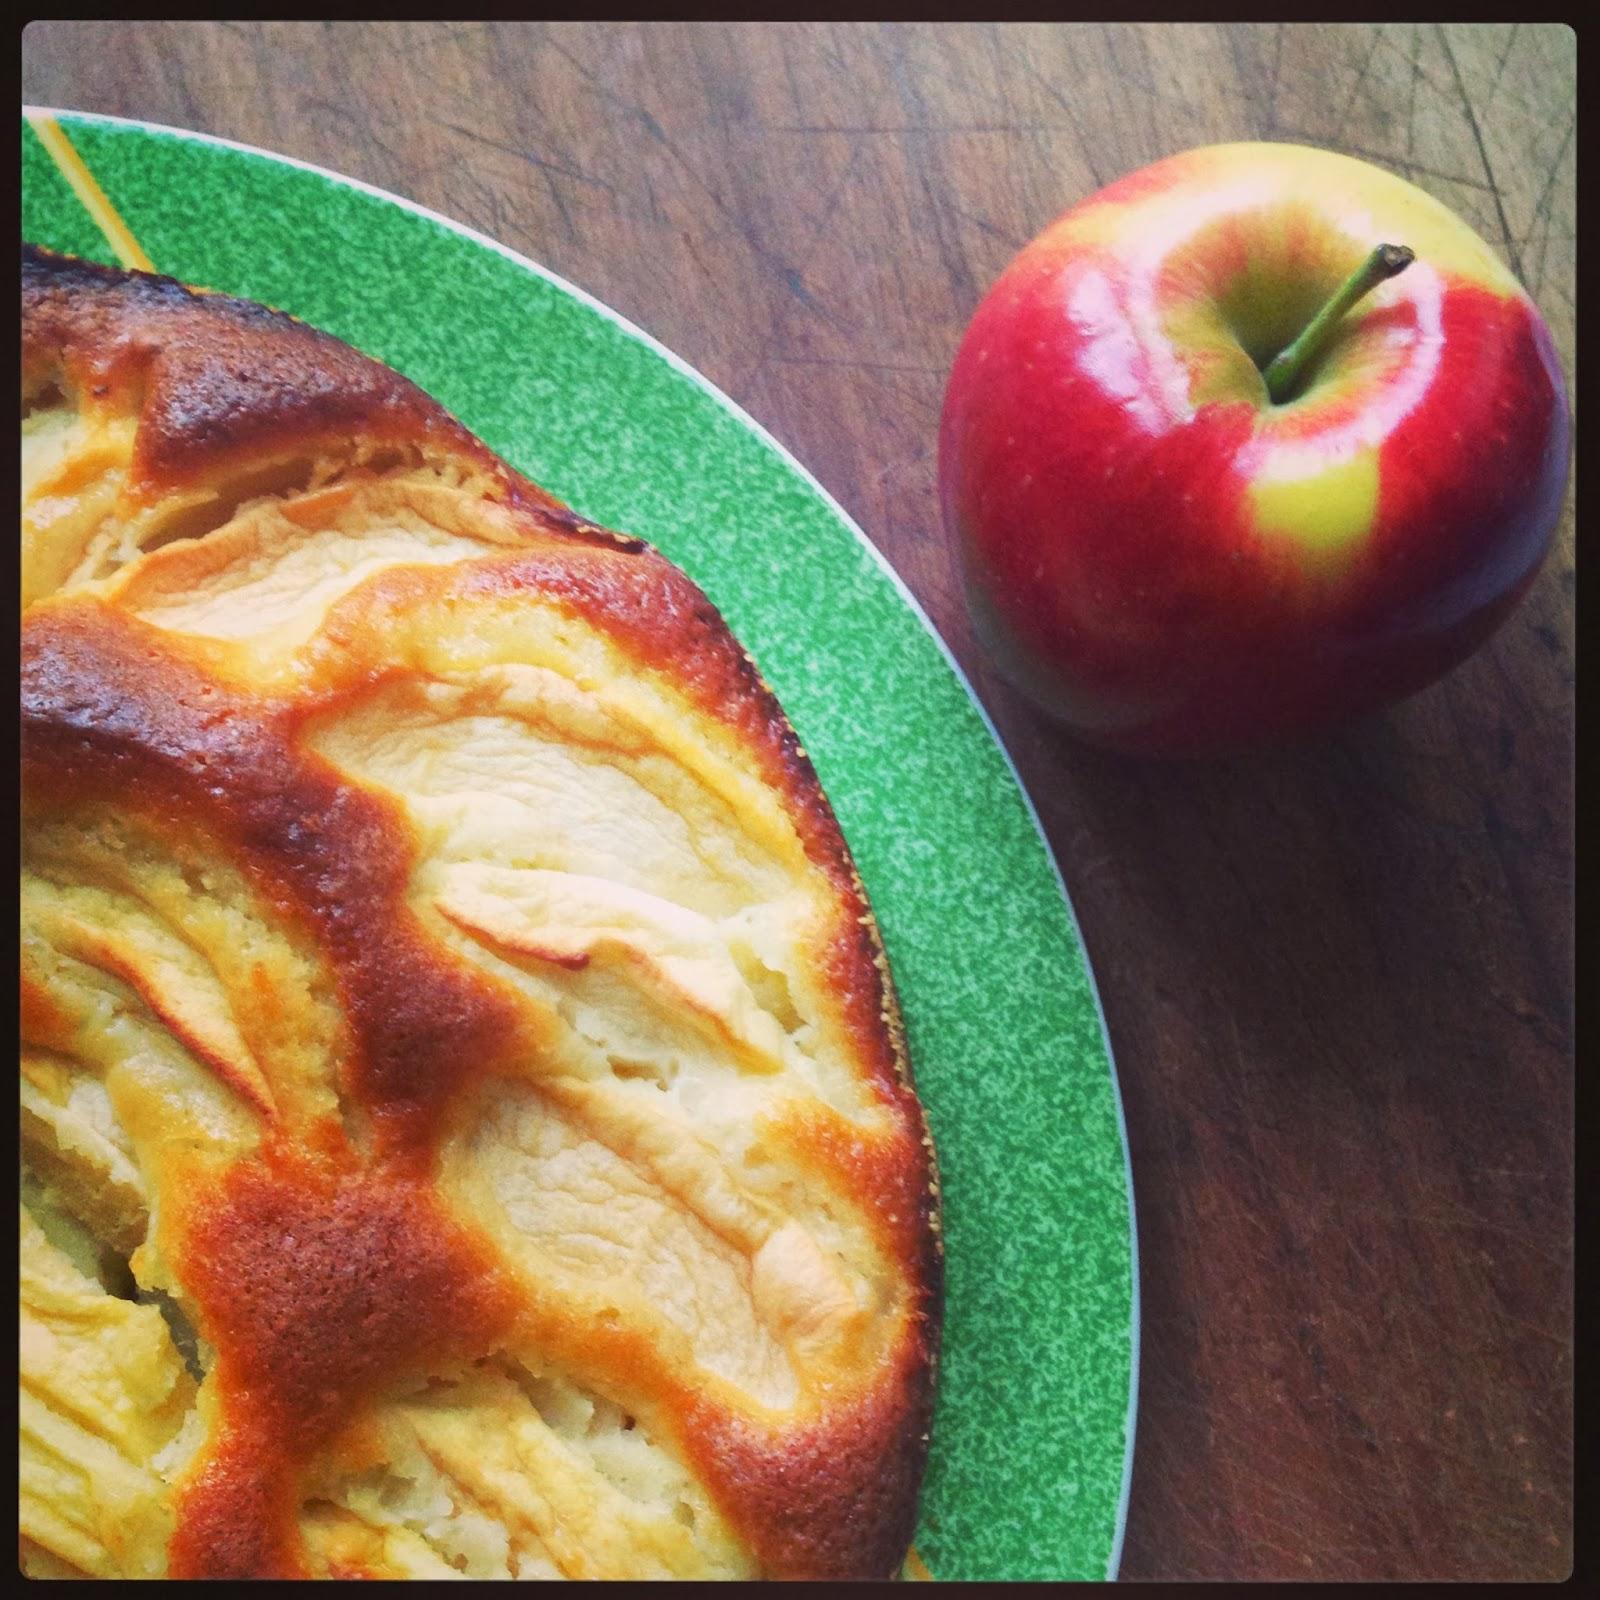 Solita torta di mele (all'EVO e profumo di rosmarino) @monsieurtatin.blogspot.it